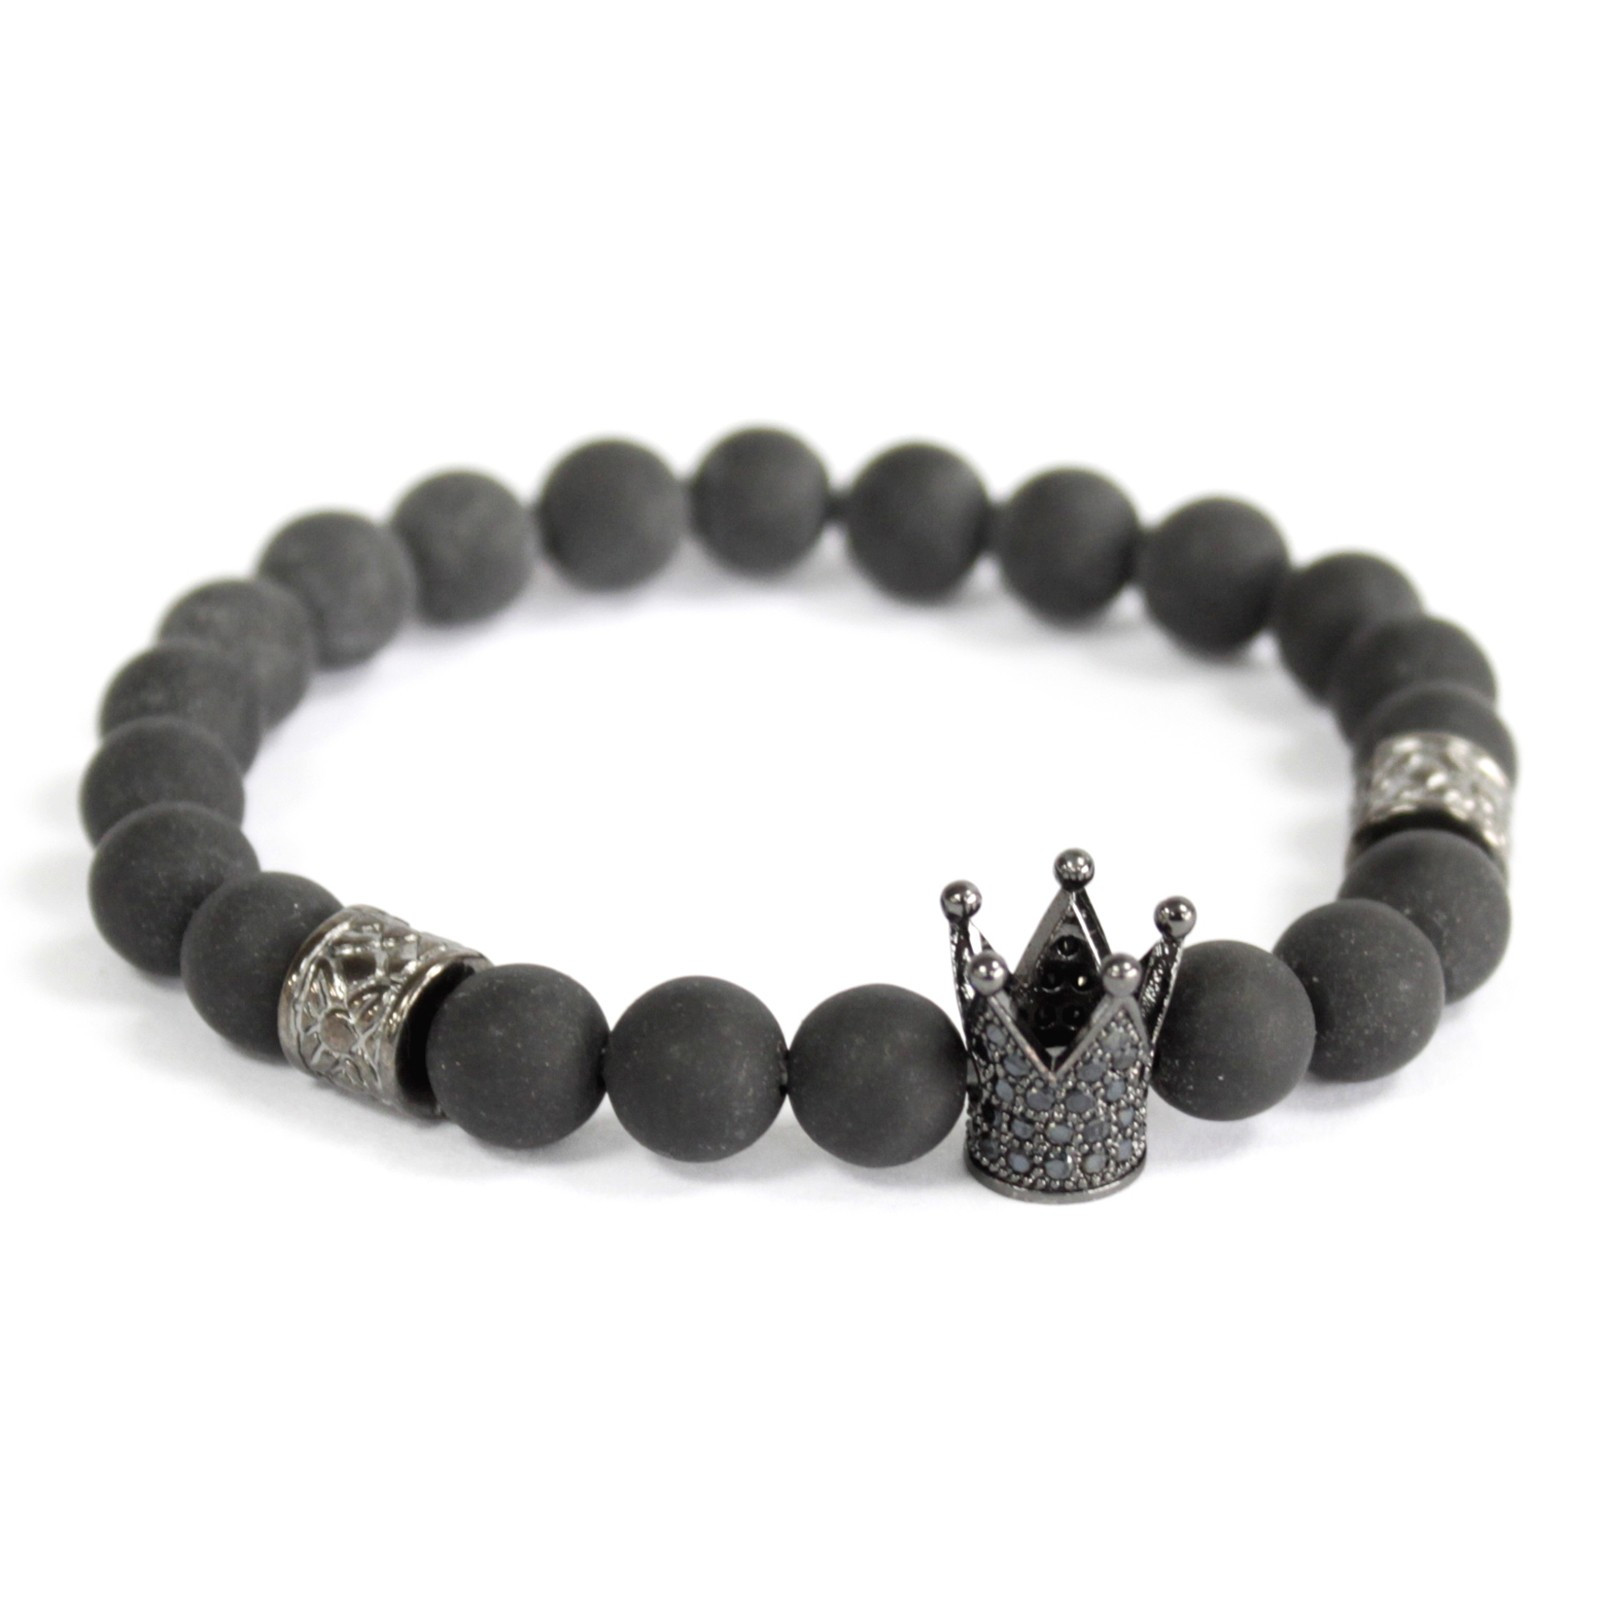 Corona de cristal / Ágata negra - Pulsera de piedras preciosas